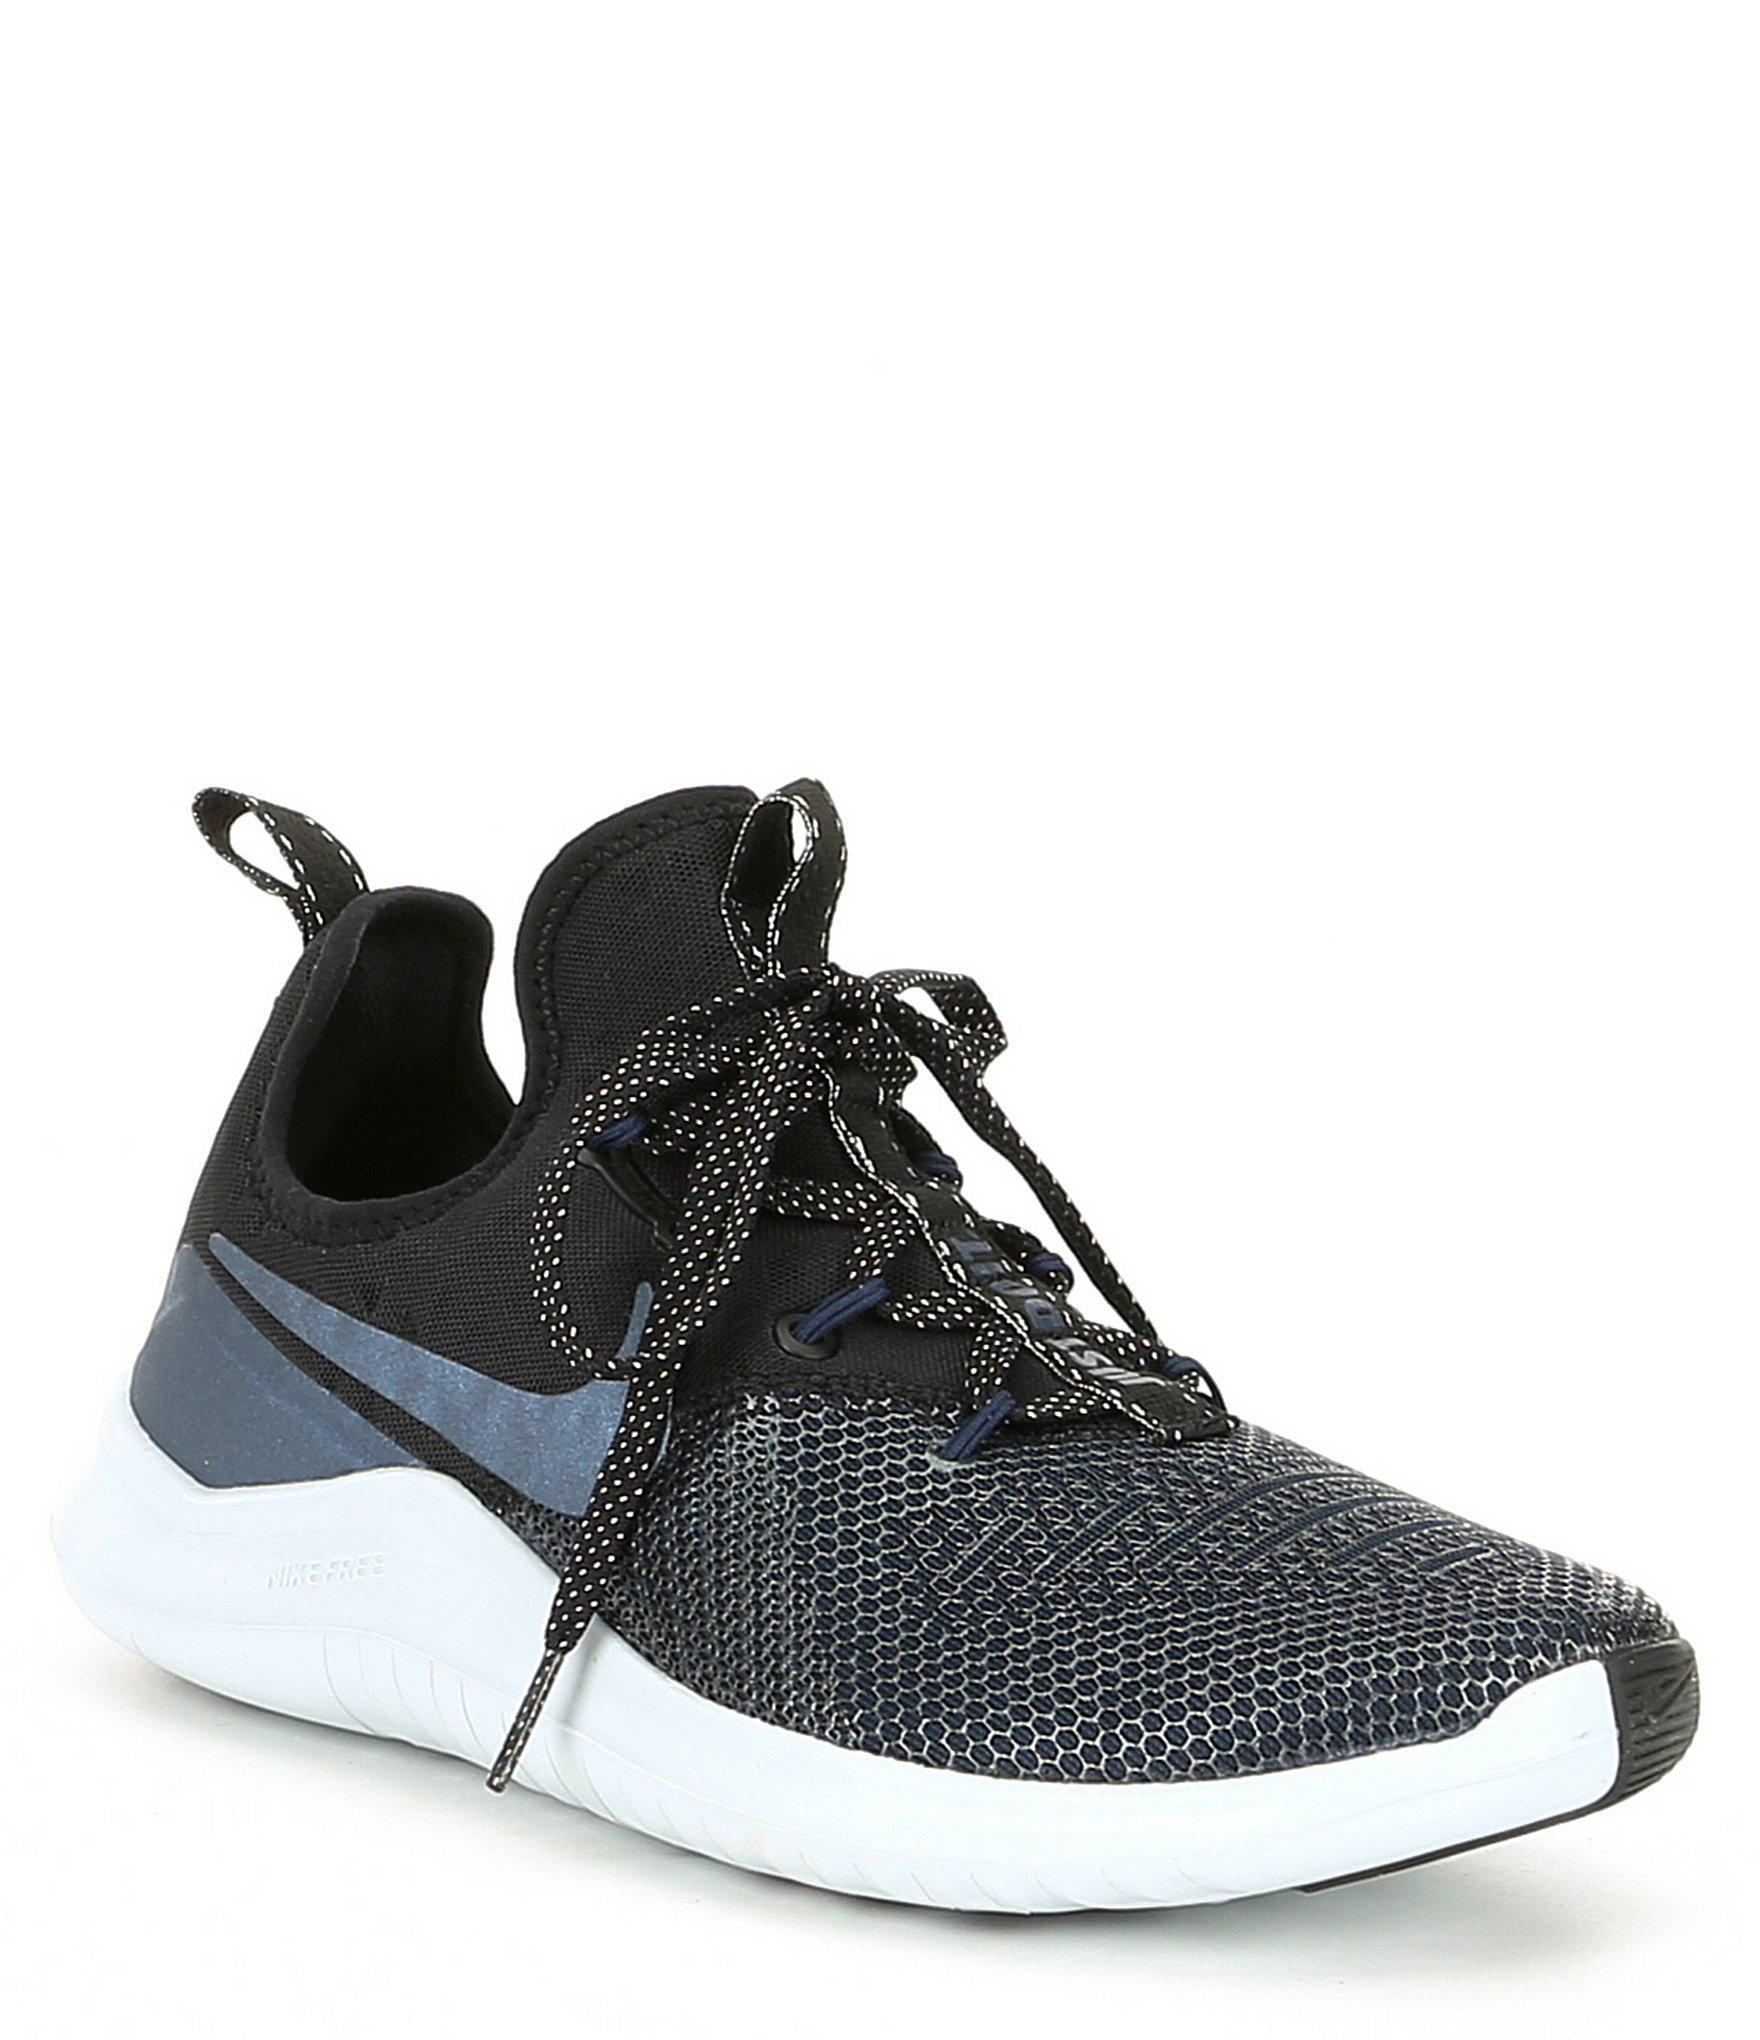 77f7bf243dd96 Lyst - Nike Women s Free Tr 8 Metallic Training Shoe in Black